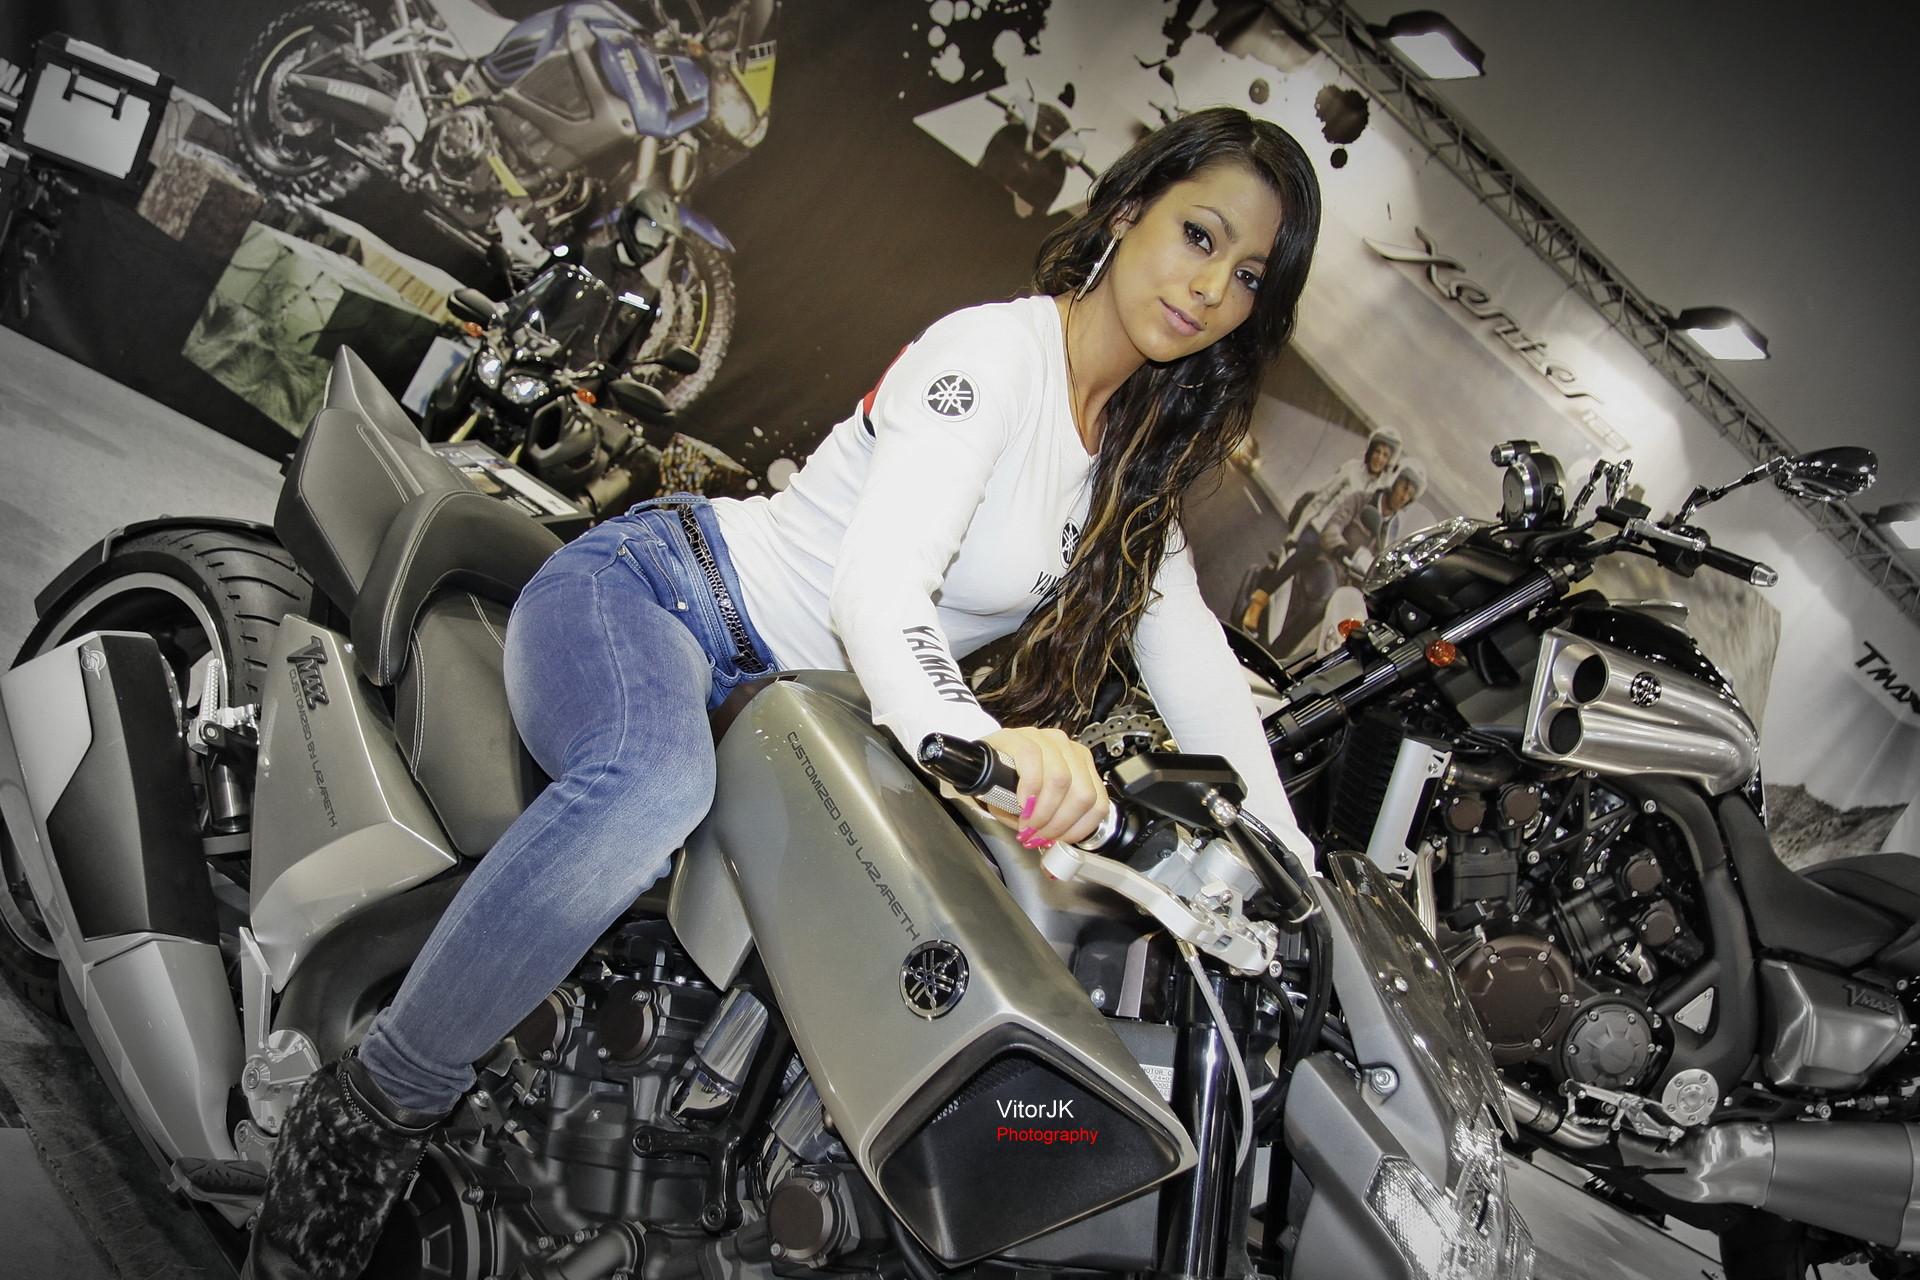 HD Wallpapers Motorcycles and Girls - WallpaperSafari